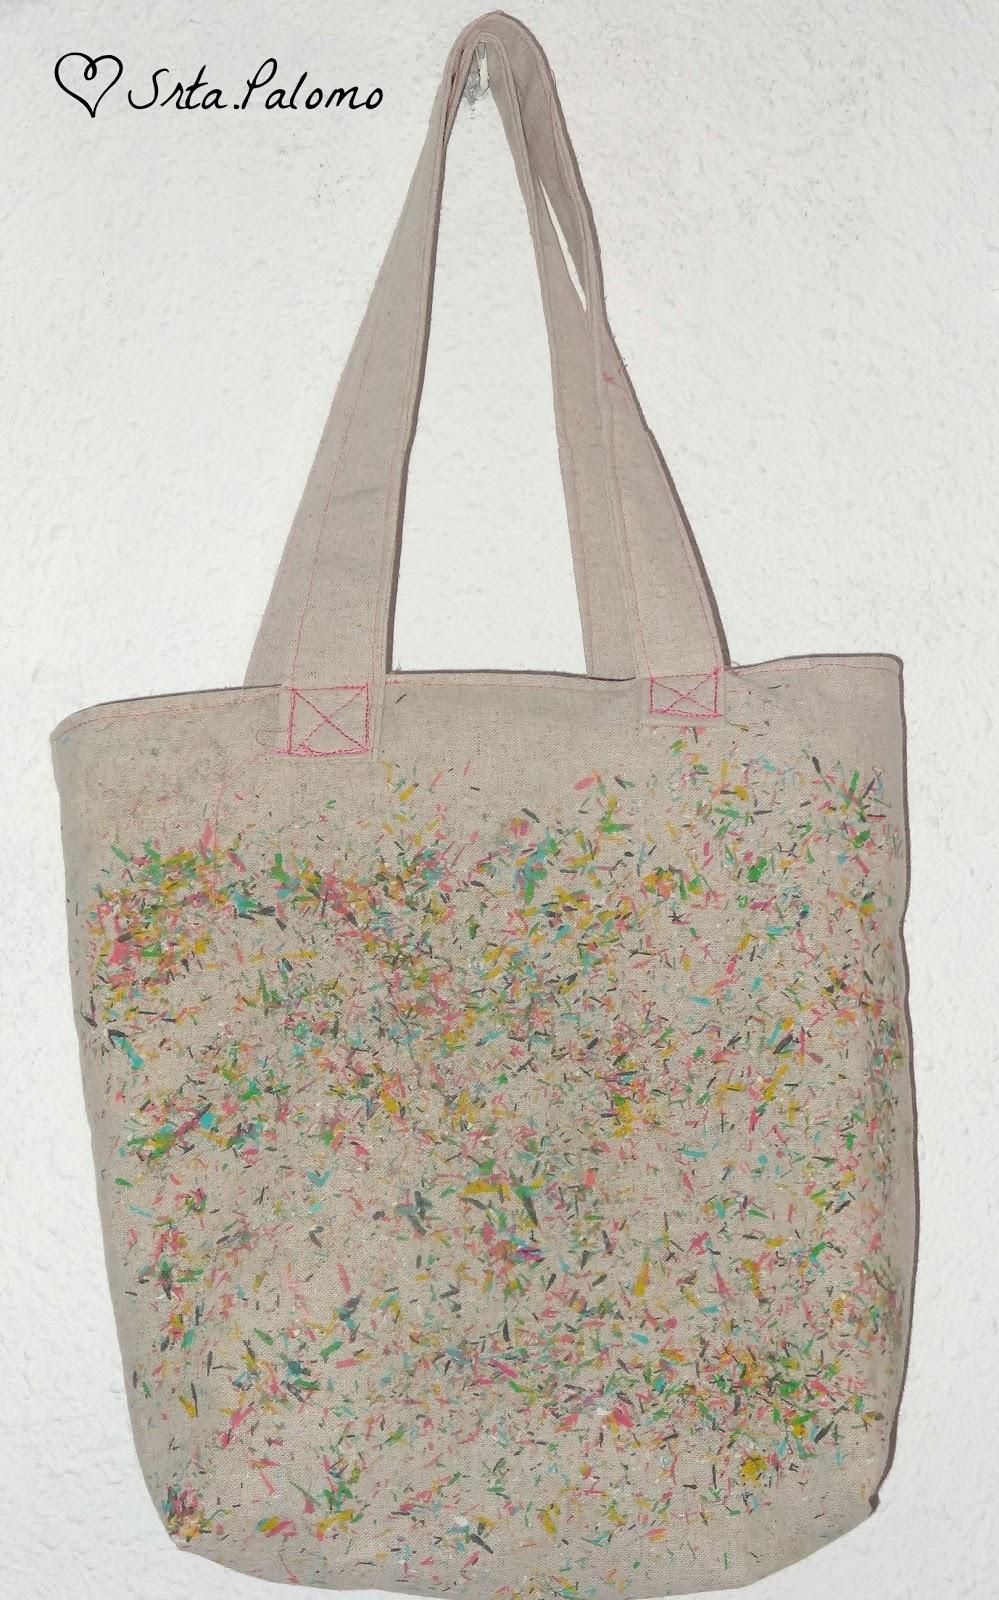 Tote bag hecho a mano